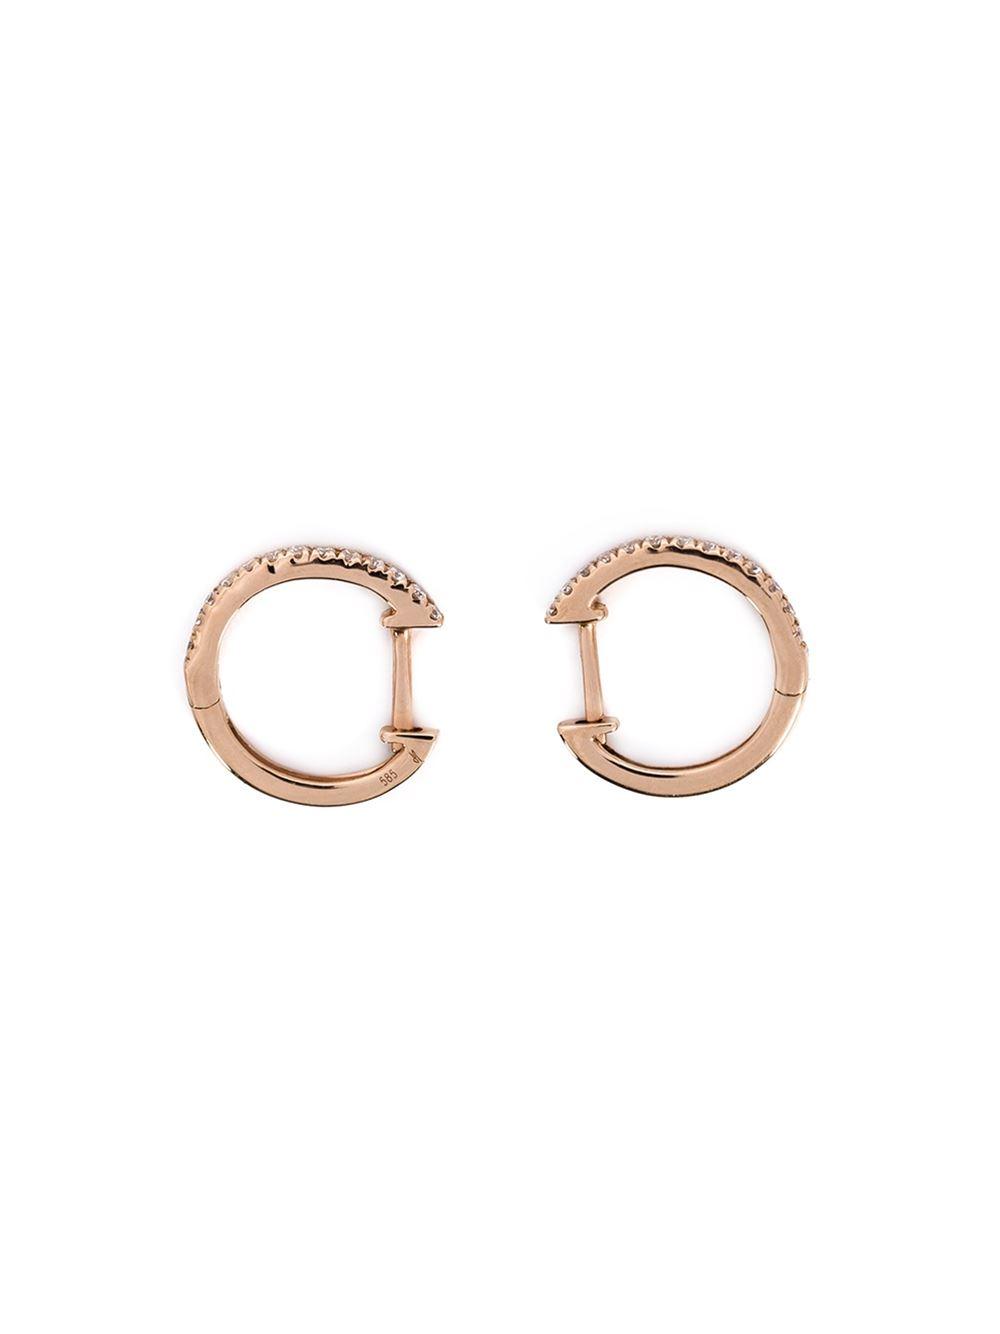 Jacquie Aiche Small Half Hoop Earrings JCXqZZAZf0